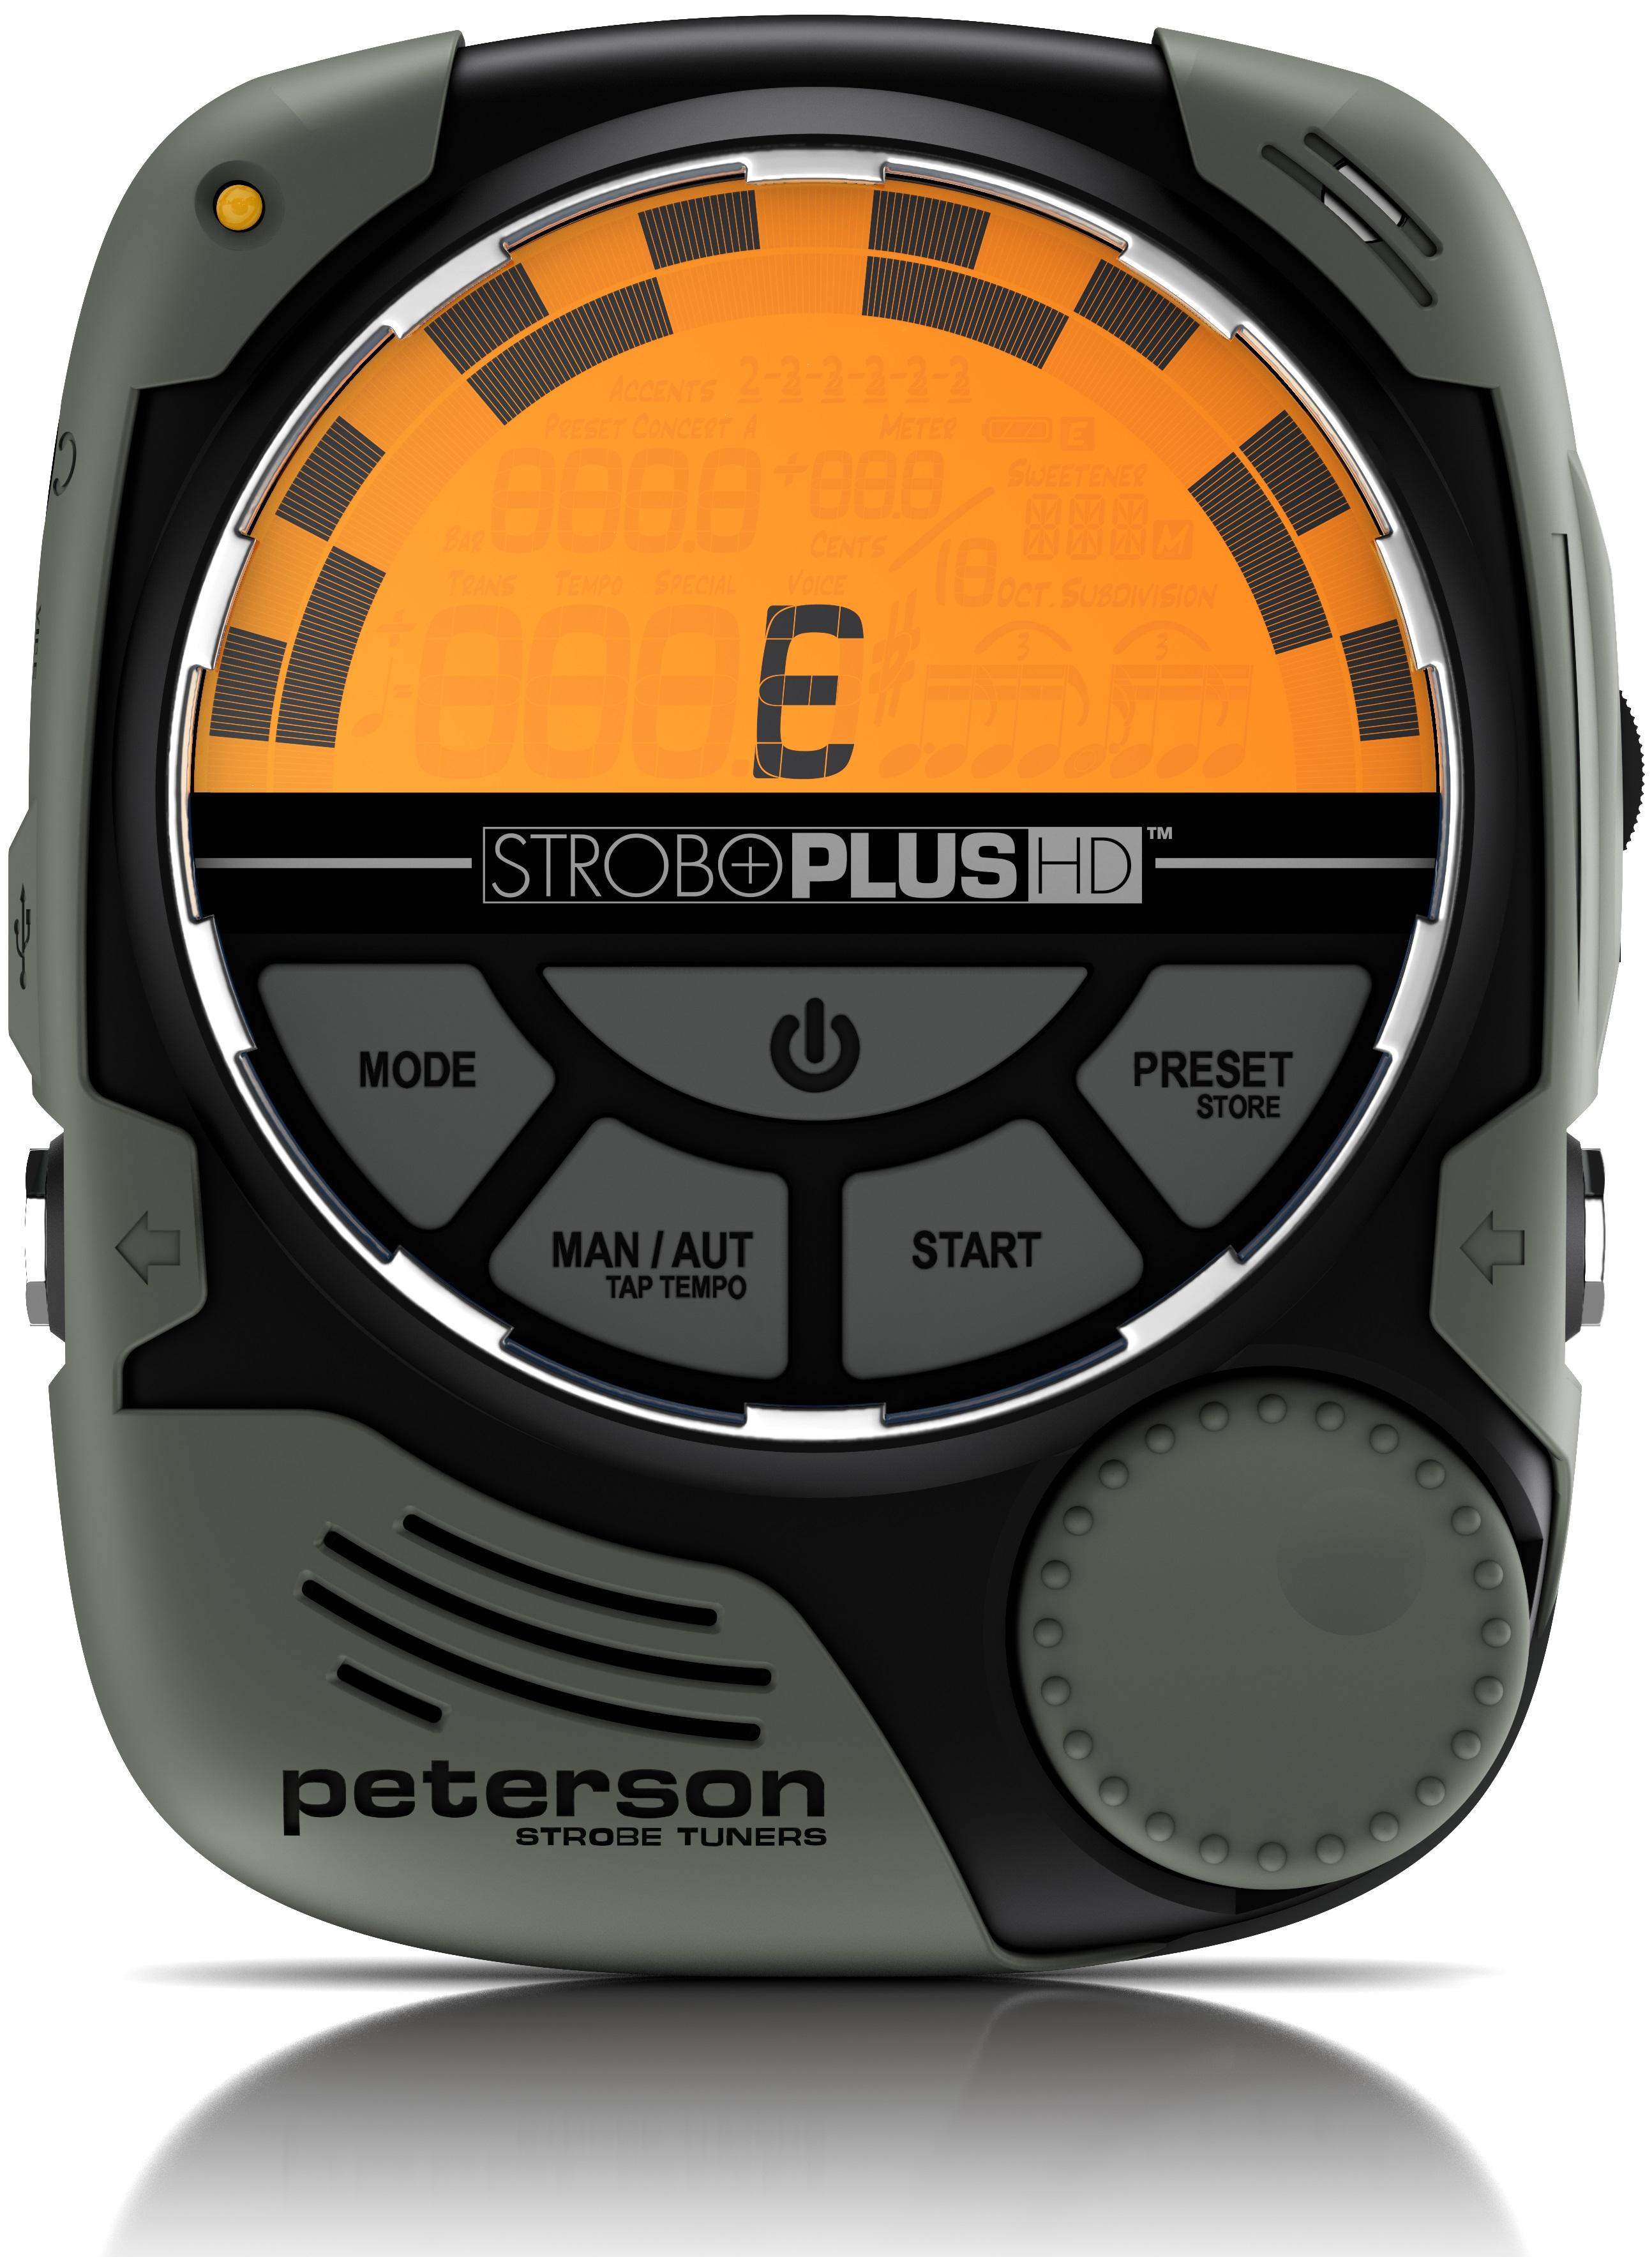 Peterson StroboPlus HD